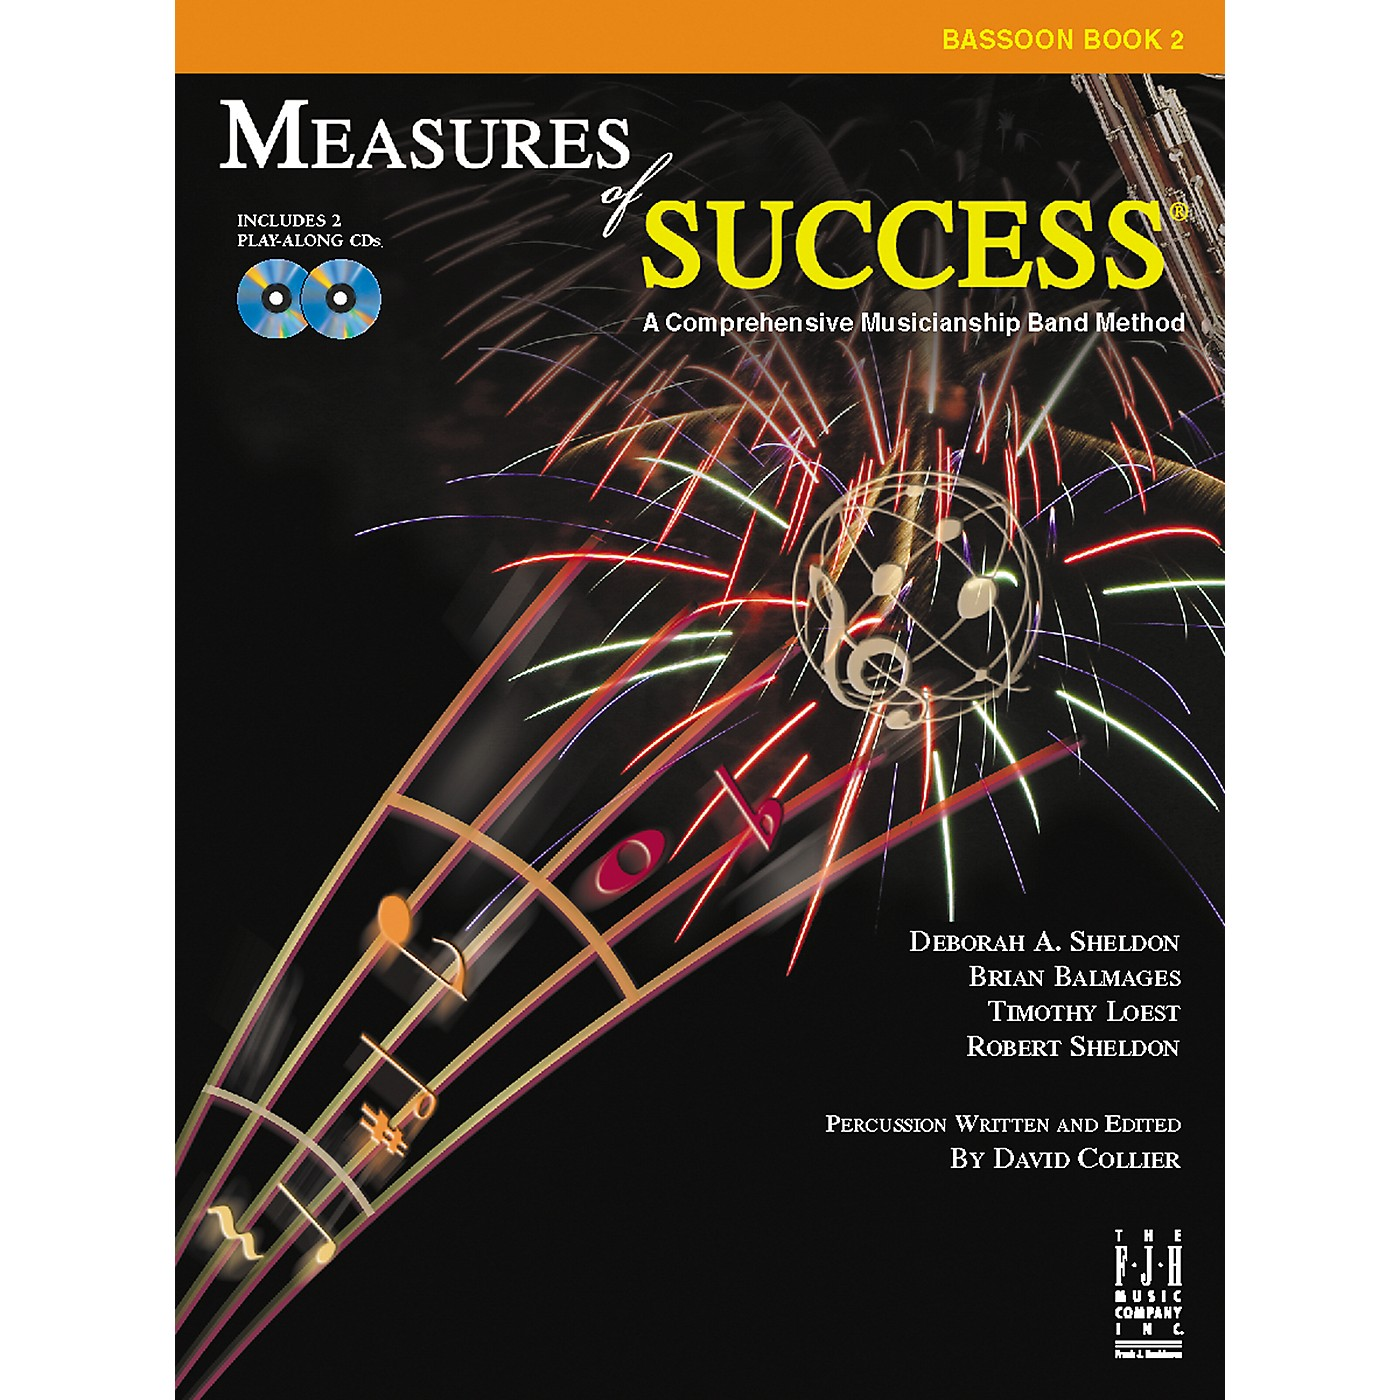 FJH Music Measures of Success Bassoon Book 2 thumbnail